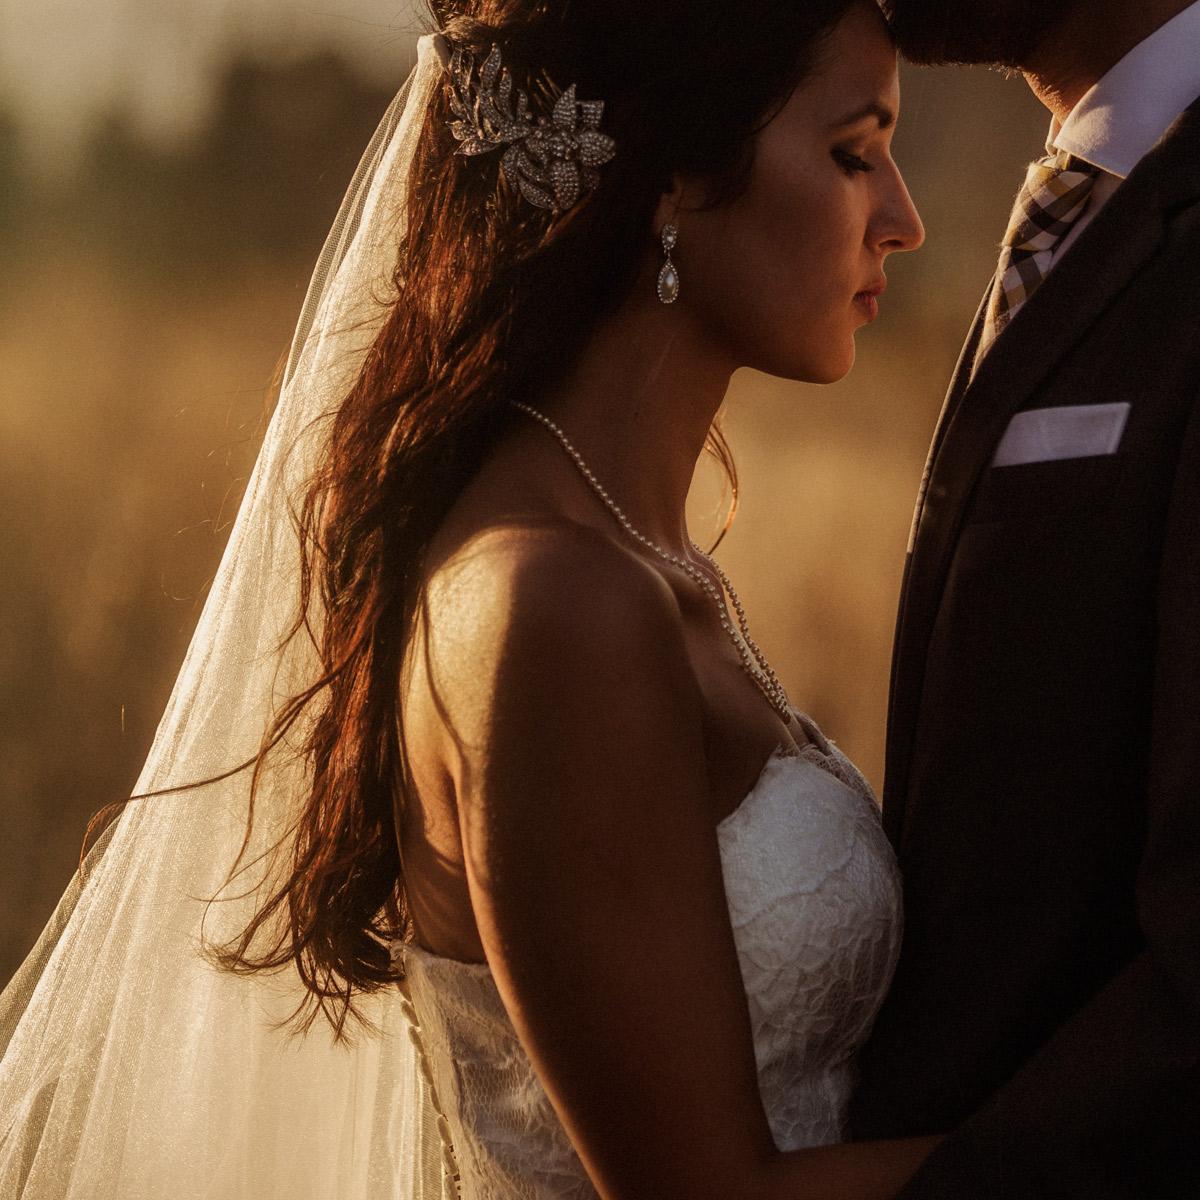 destination_wedding_photography_jonas_peterson029